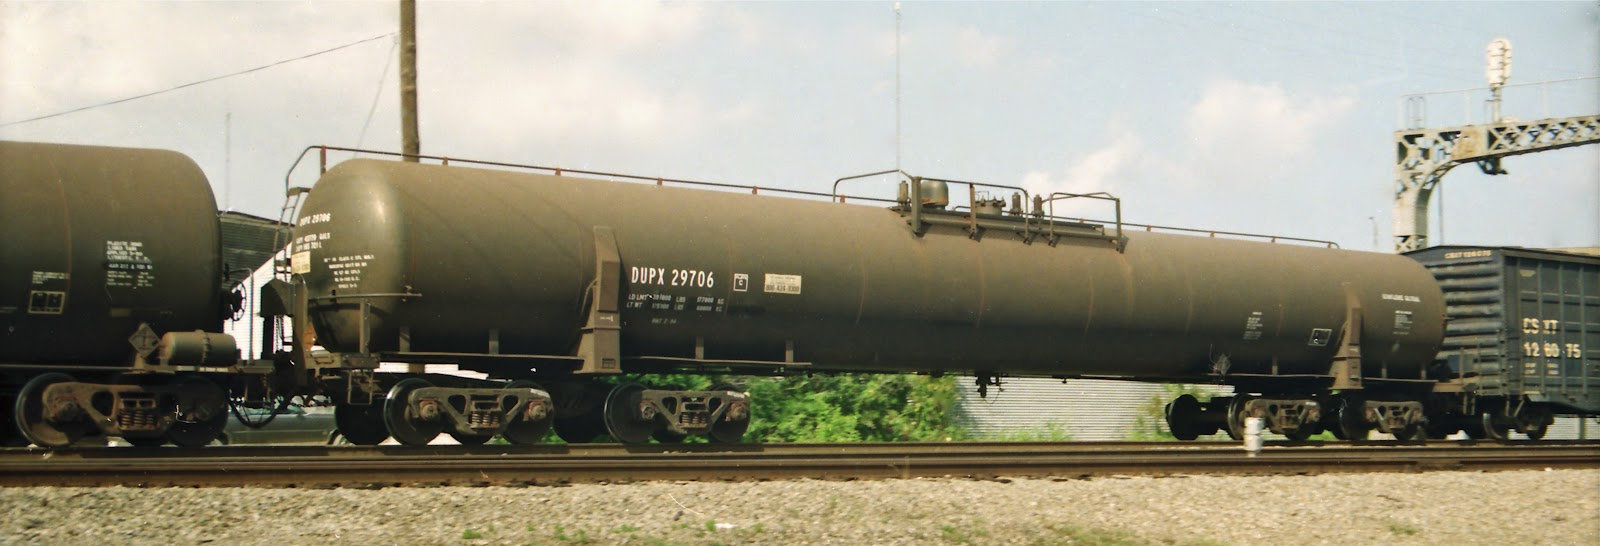 Hointerchange Seaboardcoast Rail Whales Part 1 Giant Tank Cars